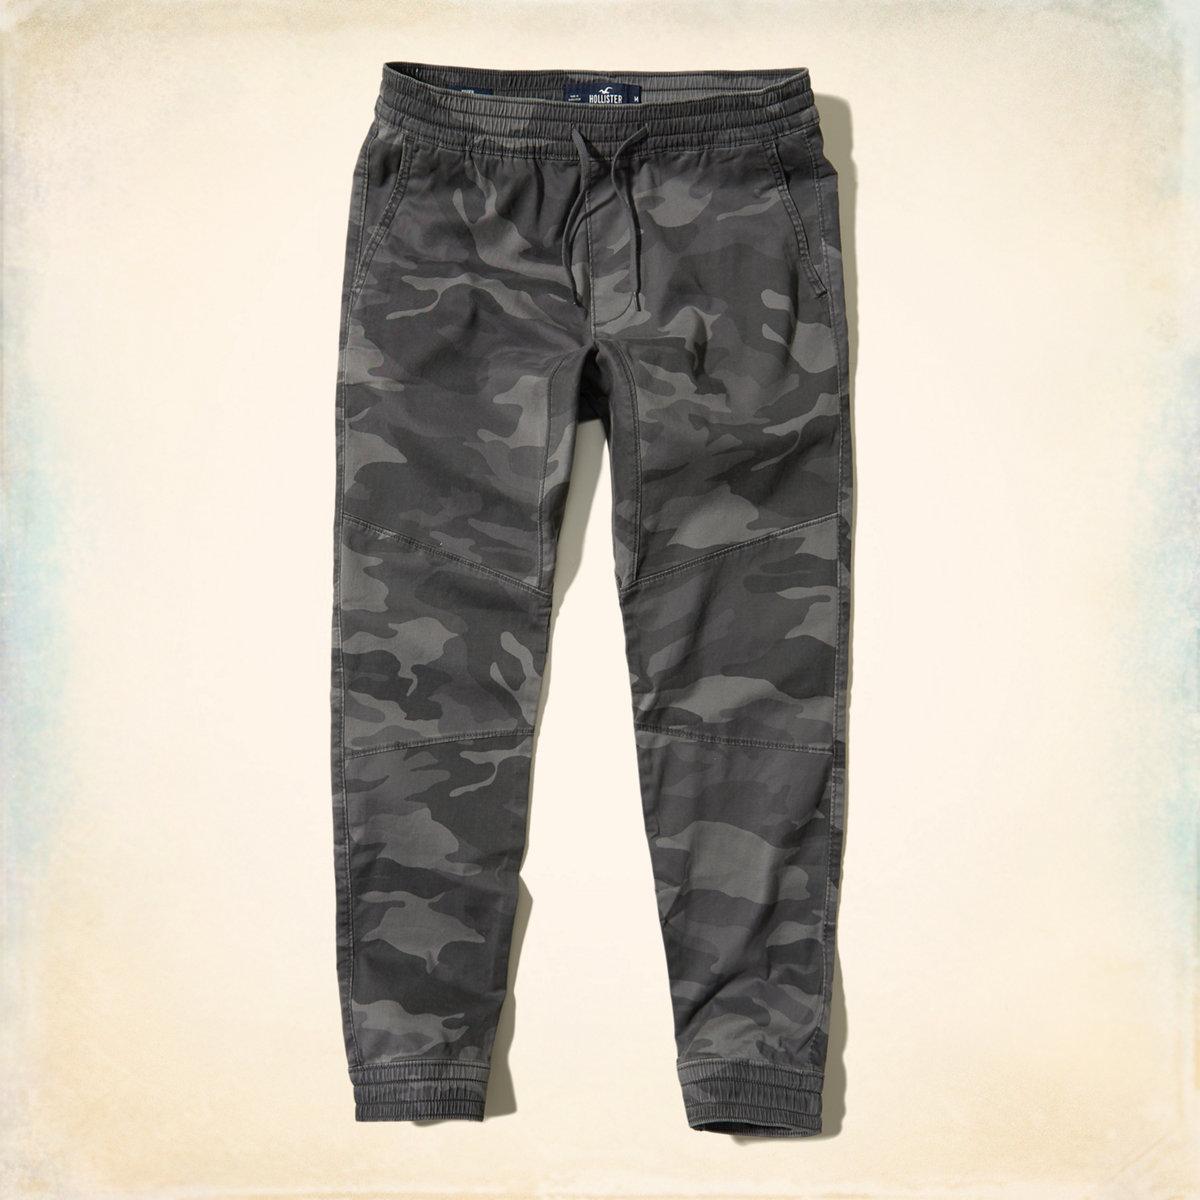 Camo Twill Jogger Pants